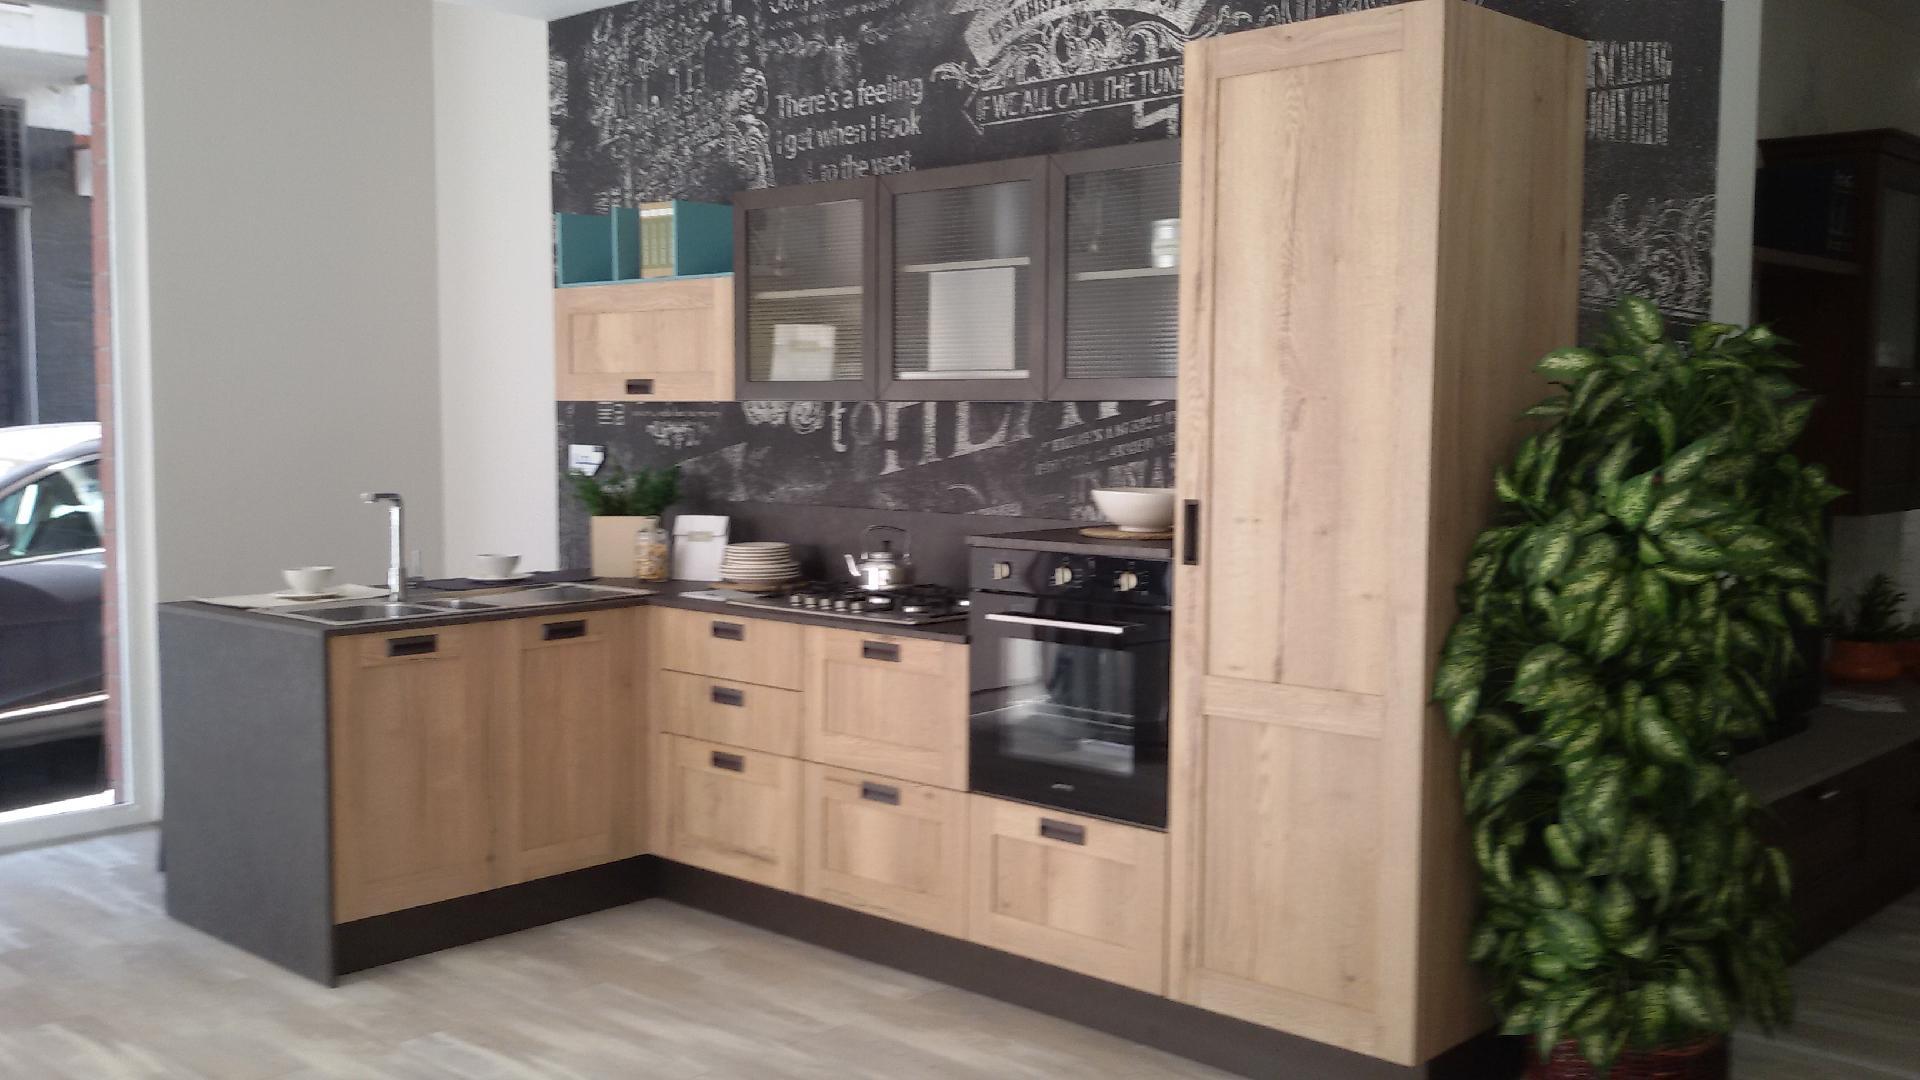 Foto show room cucine componibili catania - Cucine componibili catania ...